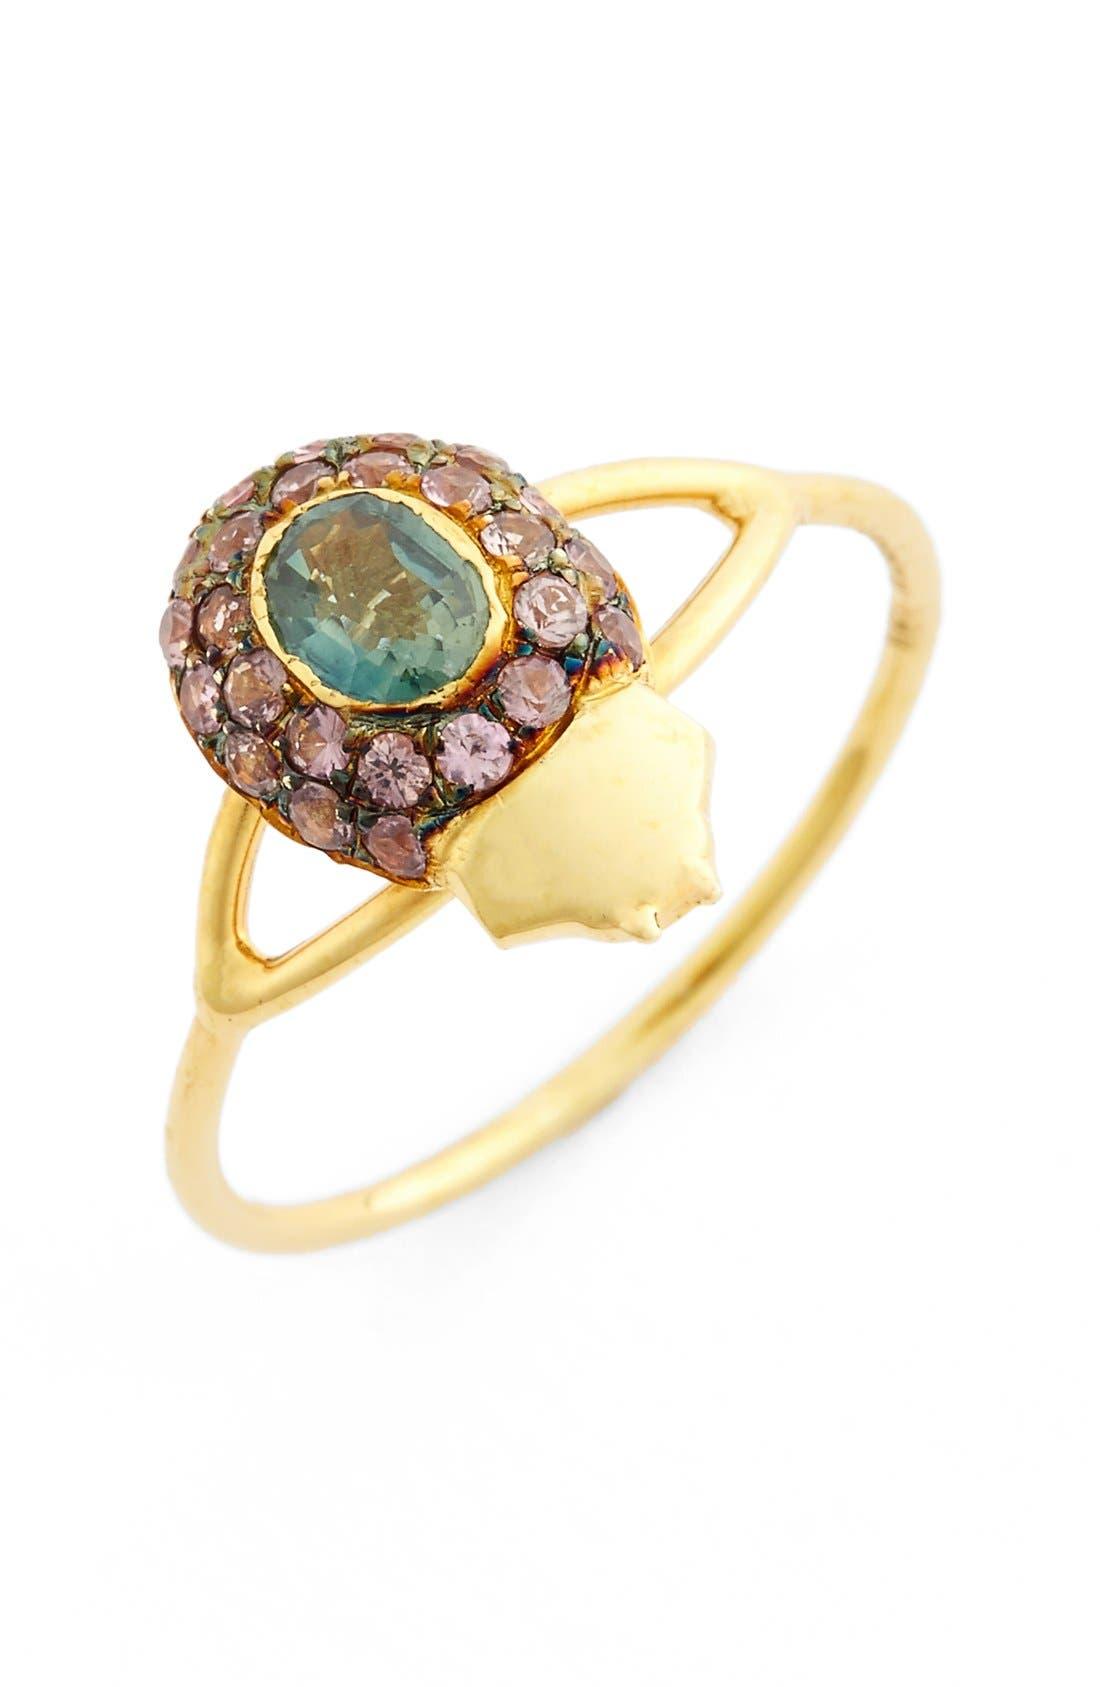 Daniela Villegas'Maat' Sapphire Ring